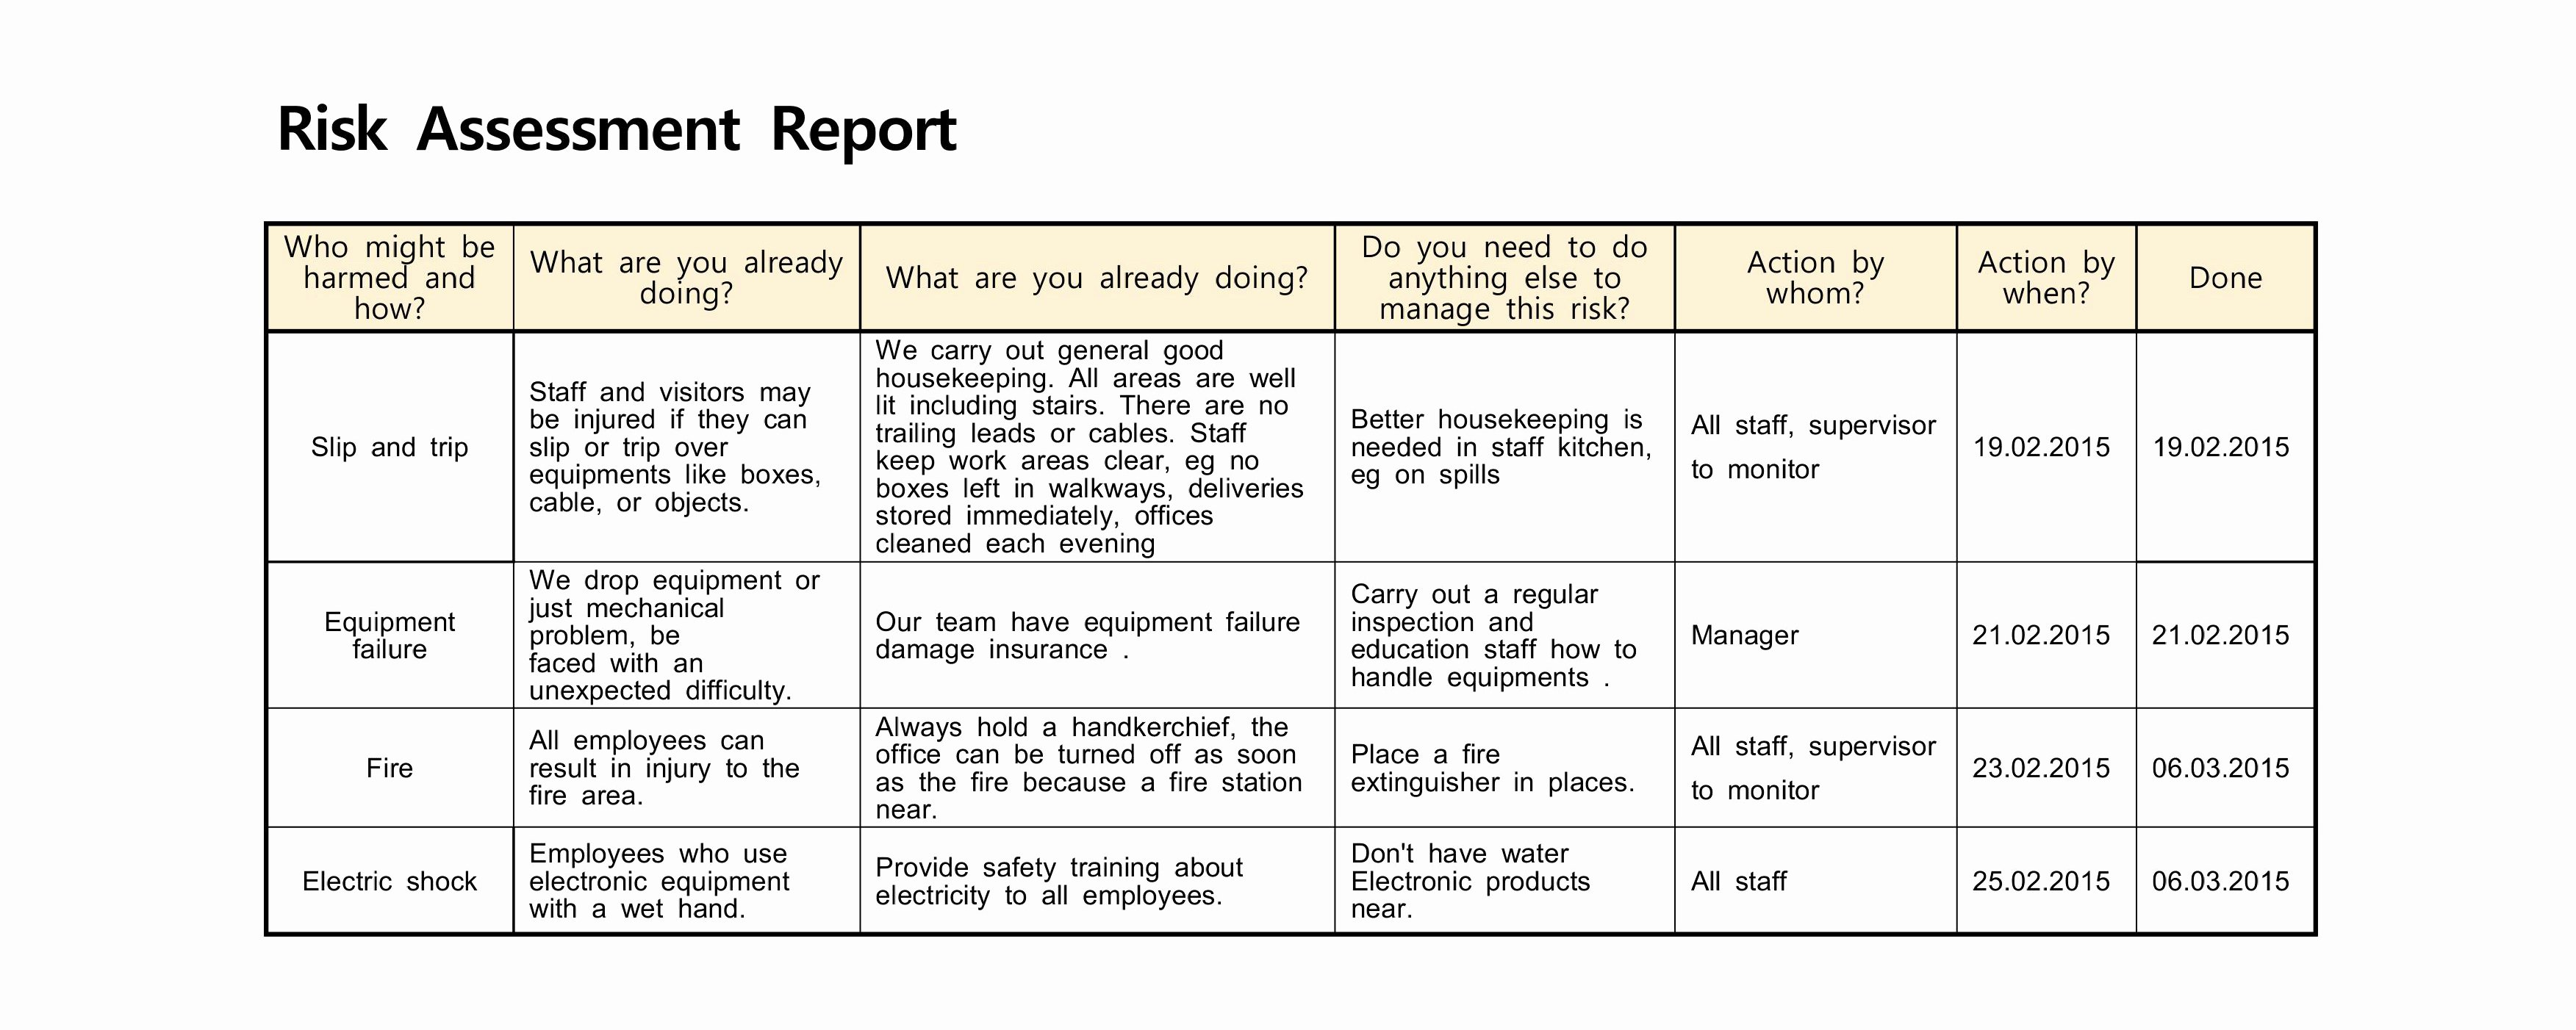 Risk assessment Report Template Unique Sample Risk assessment Report Design Templates